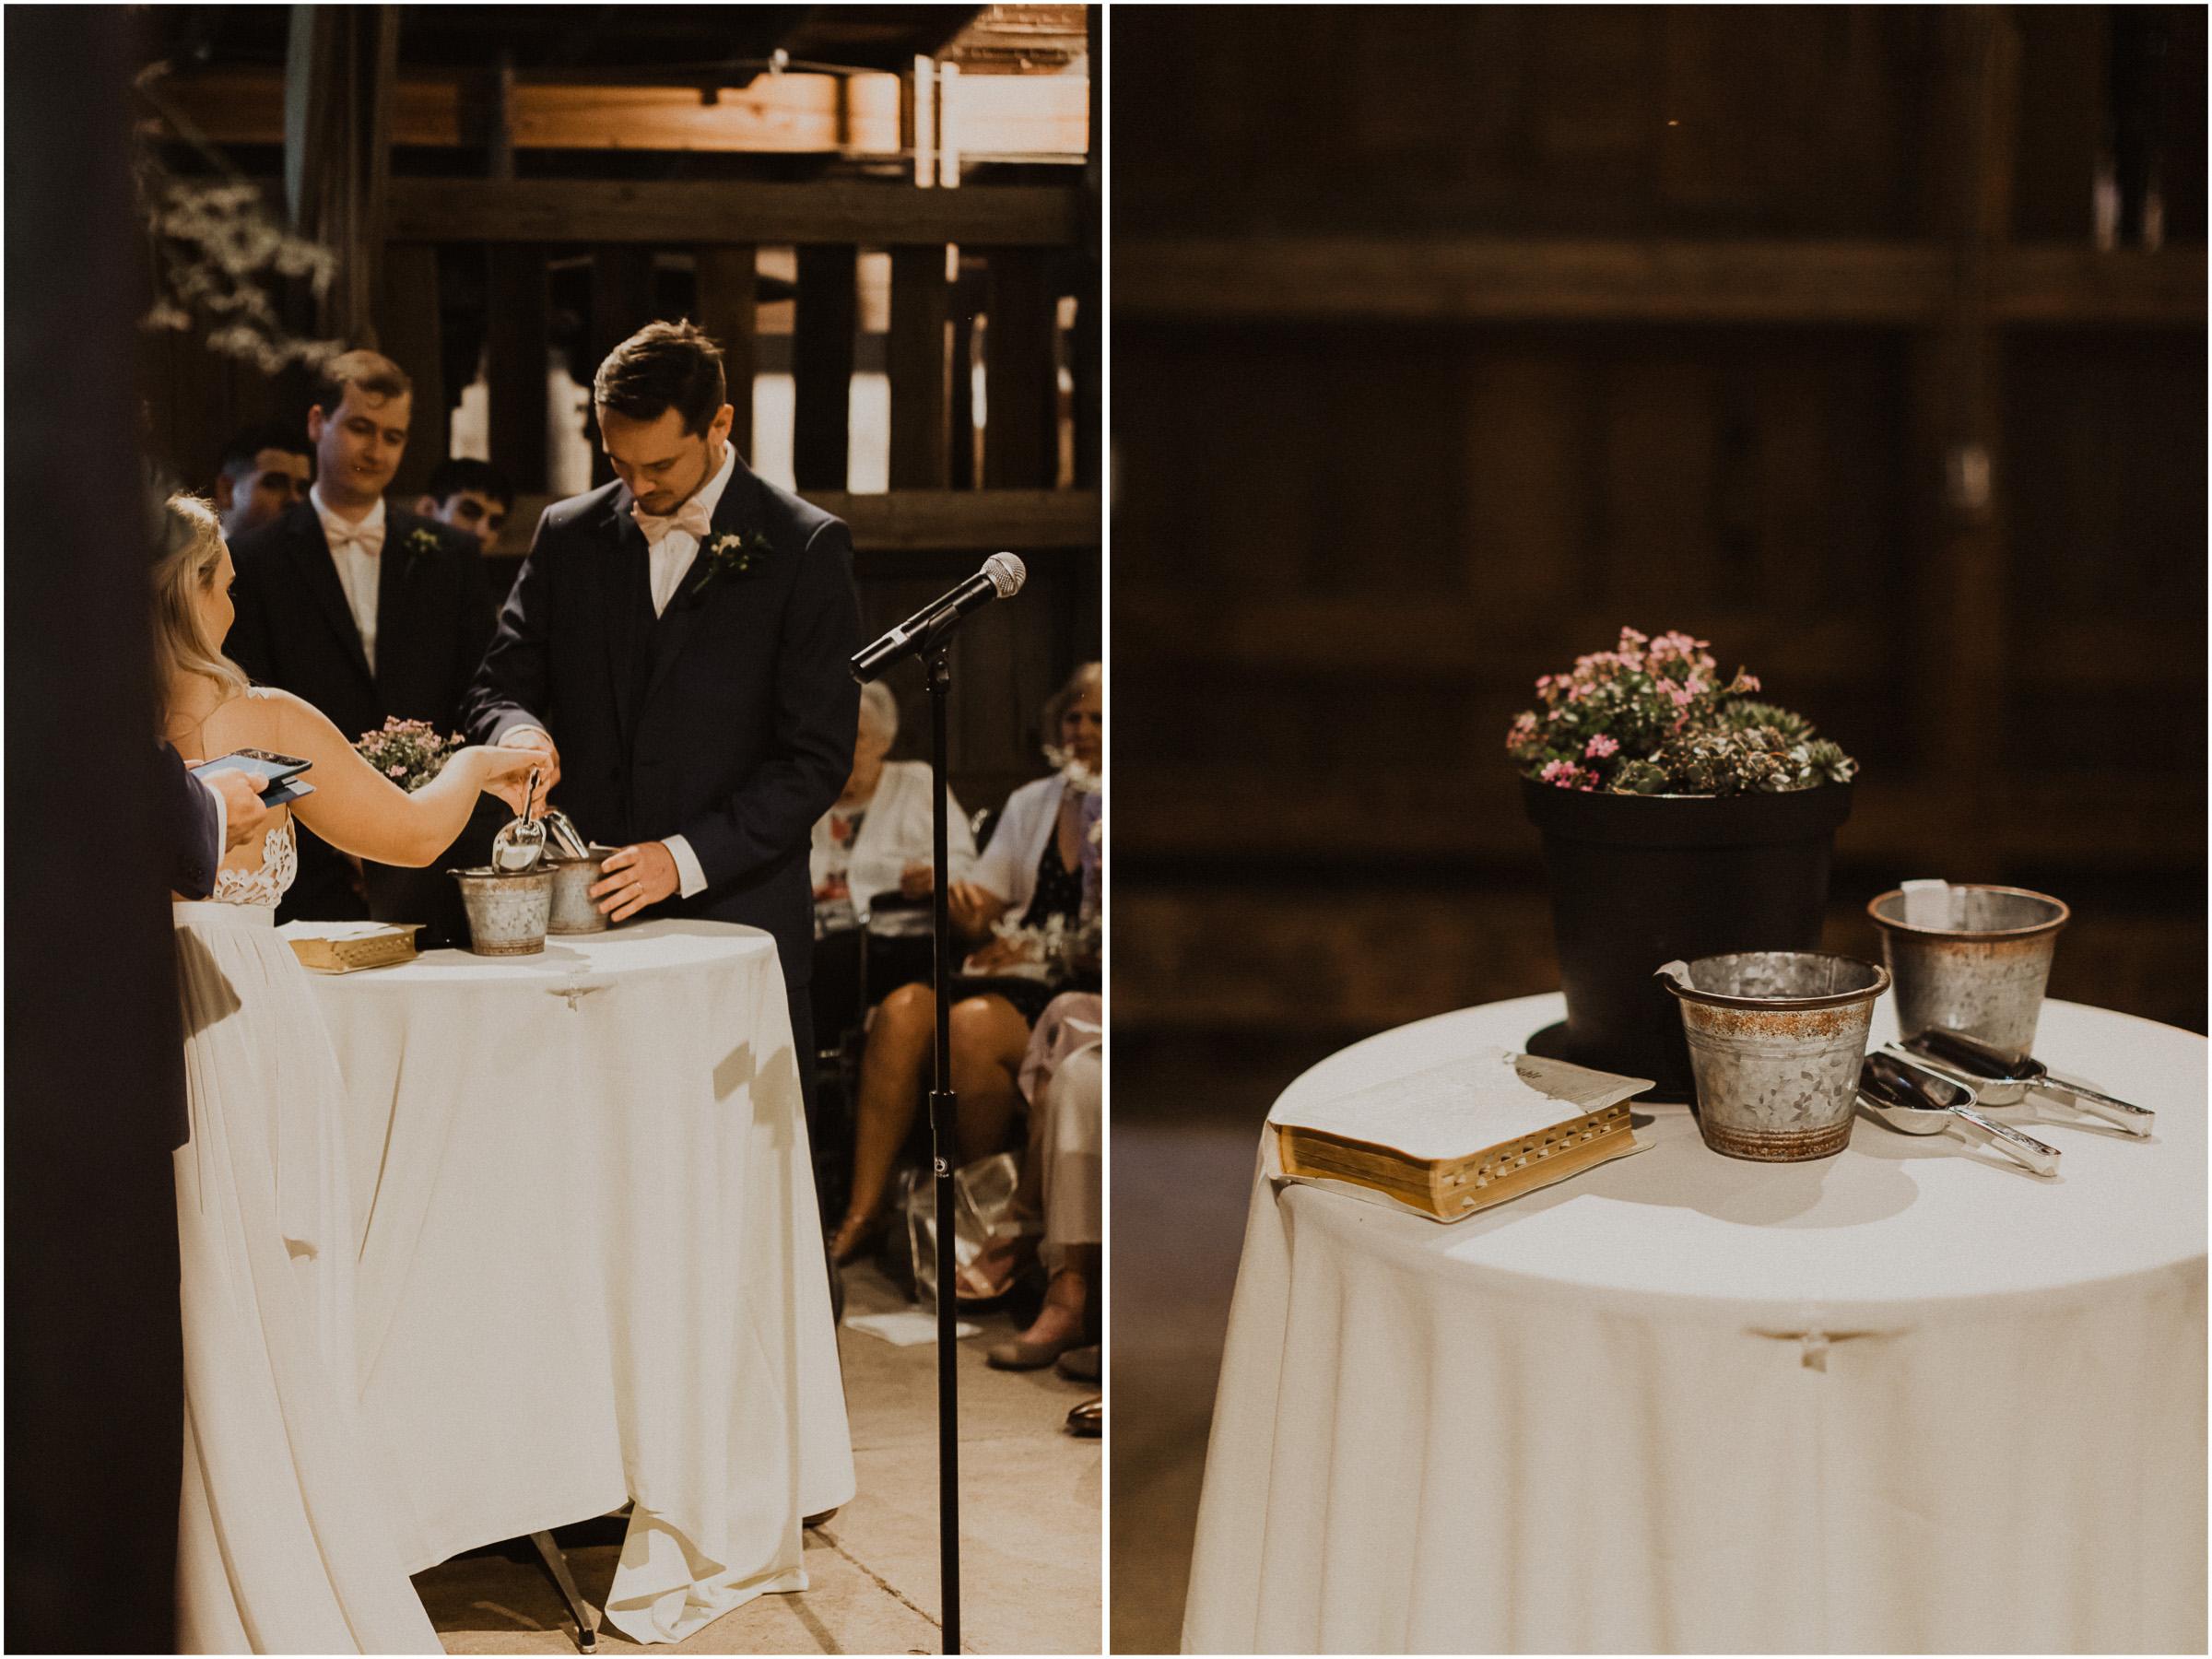 alyssa barletter photography nelson wedding nebraska city lied lodge morton barn spring wedding photographer-38.jpg